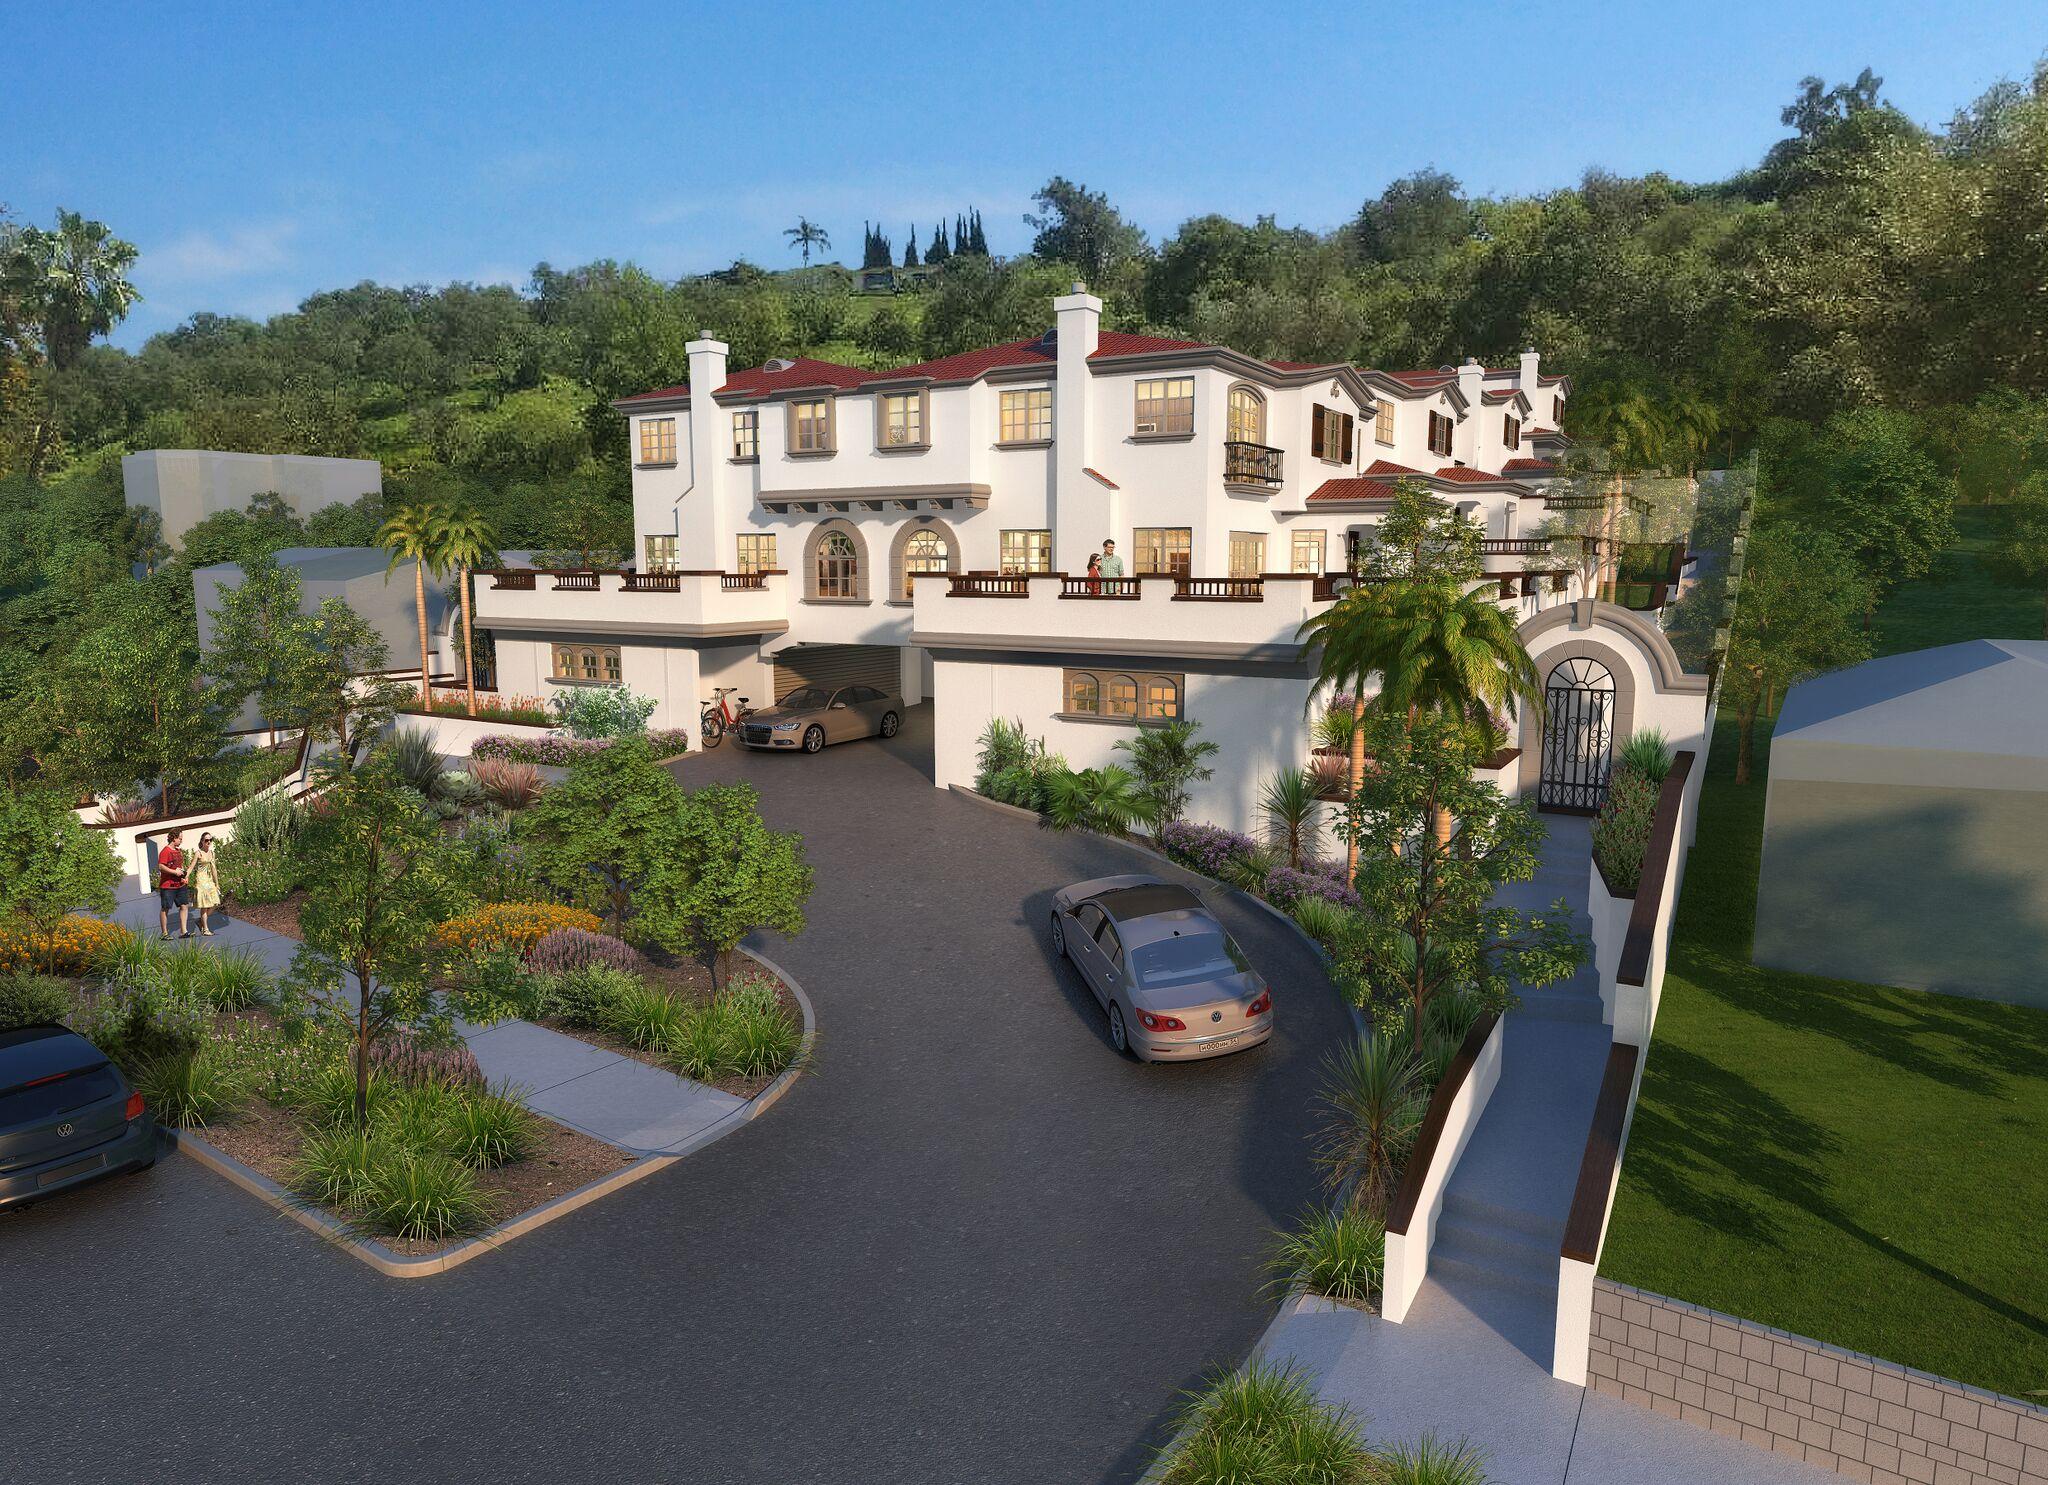 South Pasadena Real Estate Development Companies